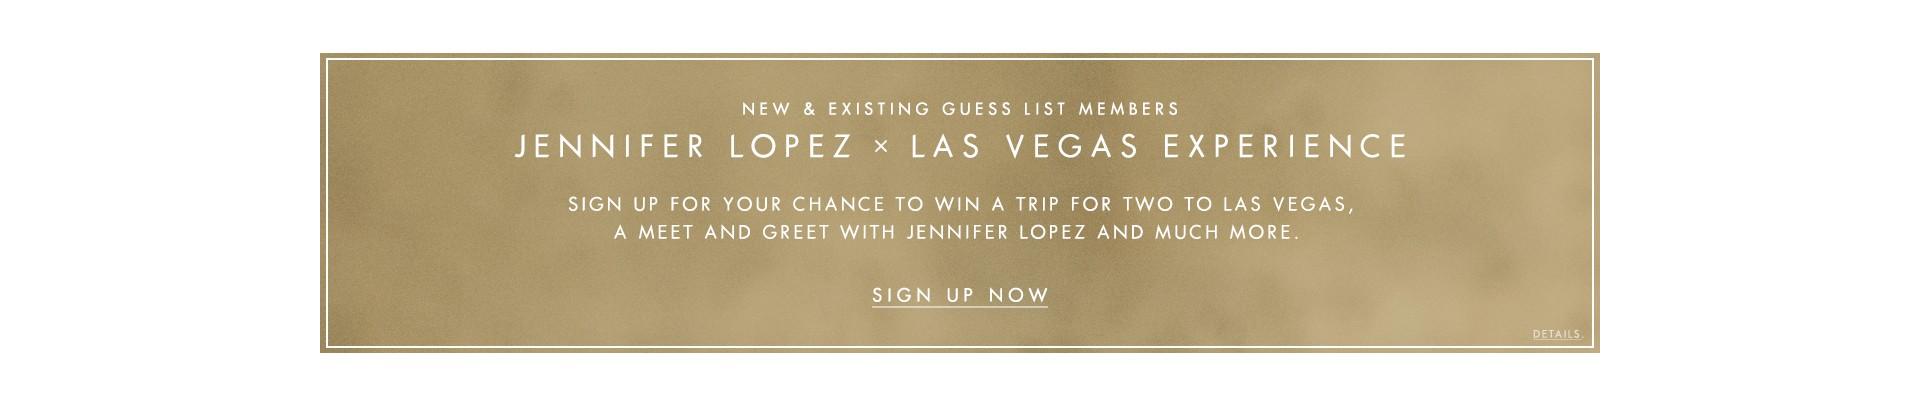 Jennifer Lopez x Las Vegas Experience